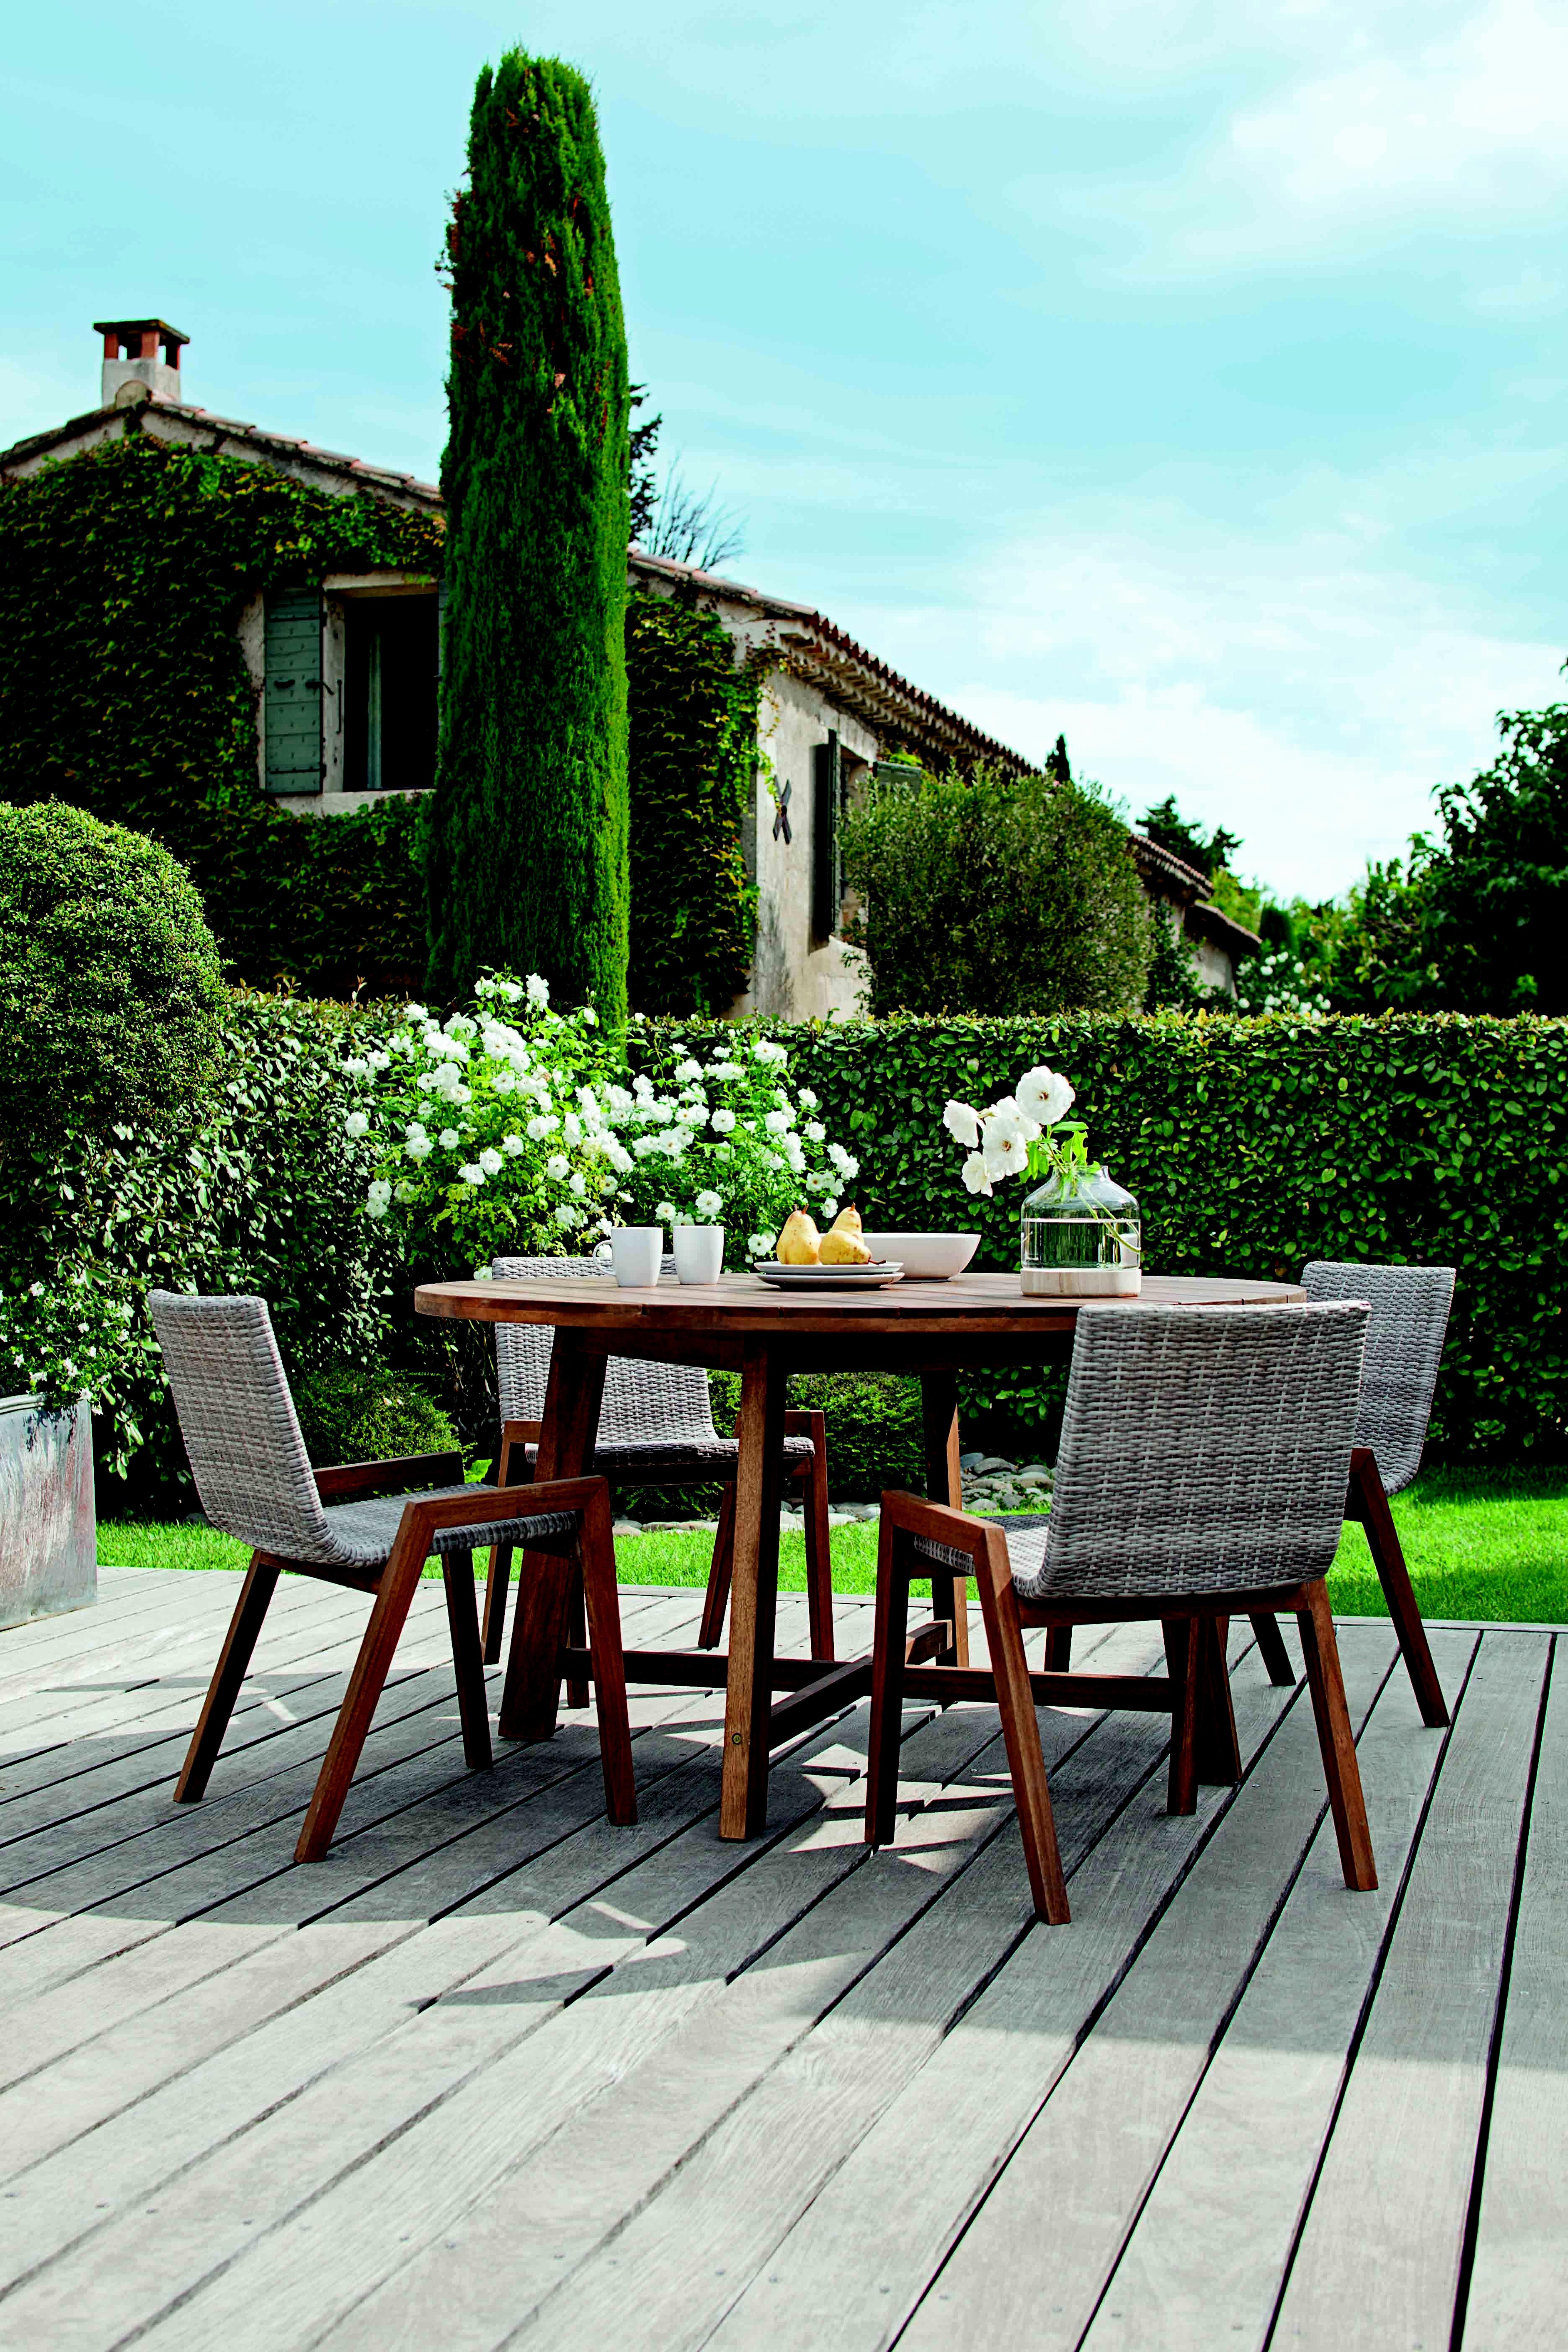 Table Pliante Leclerc Luxe Photos Table De Jardin En Bois Pliante Luxe Catalogue Leclerc Jardin